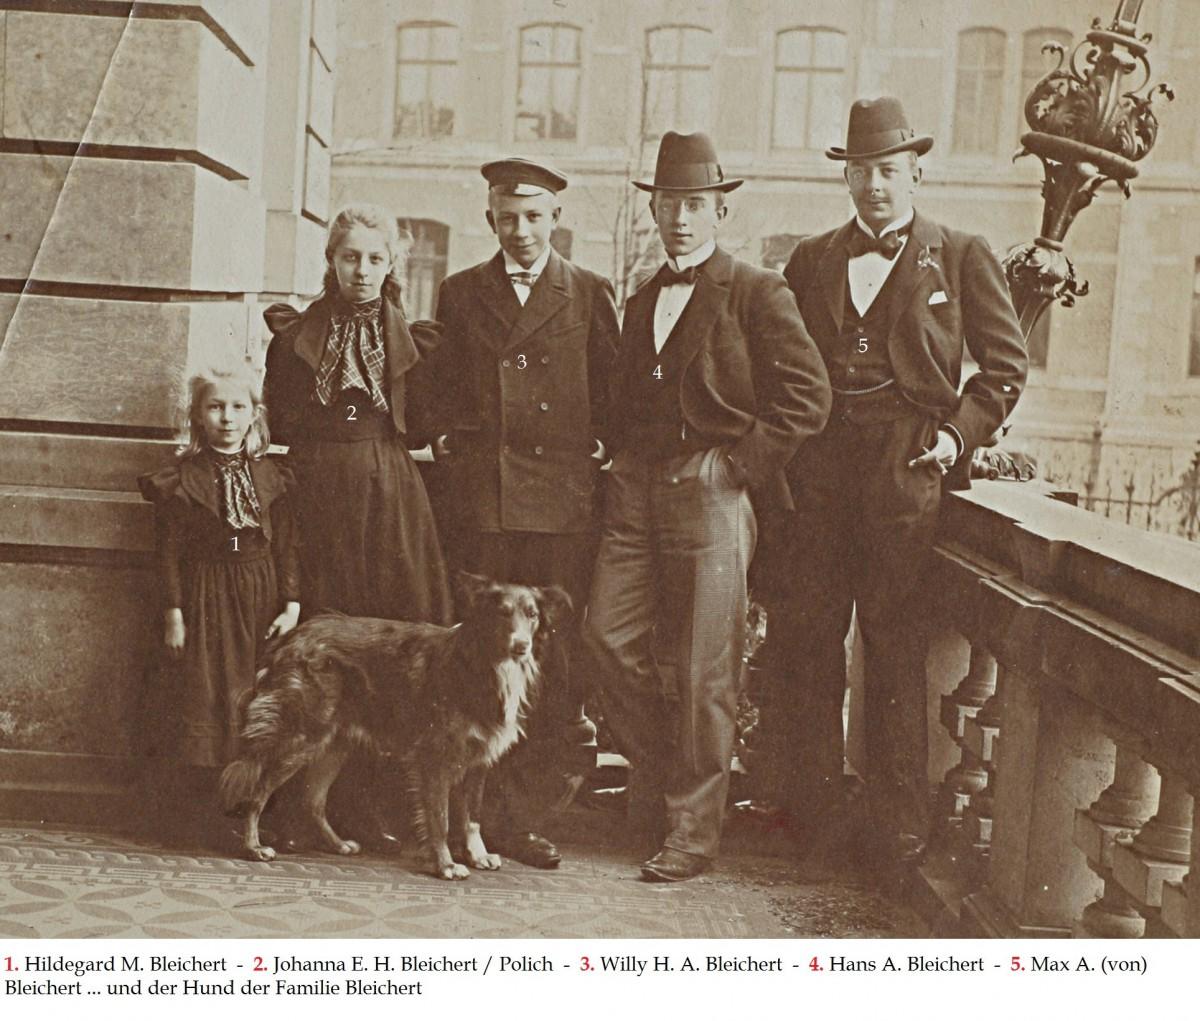 Balcony Villa Hilda Leipzig-Gohlis-Johanna B.-Polich,Hildegard +4.5.1901, Willy, Hans , Max Bleichert - Copia